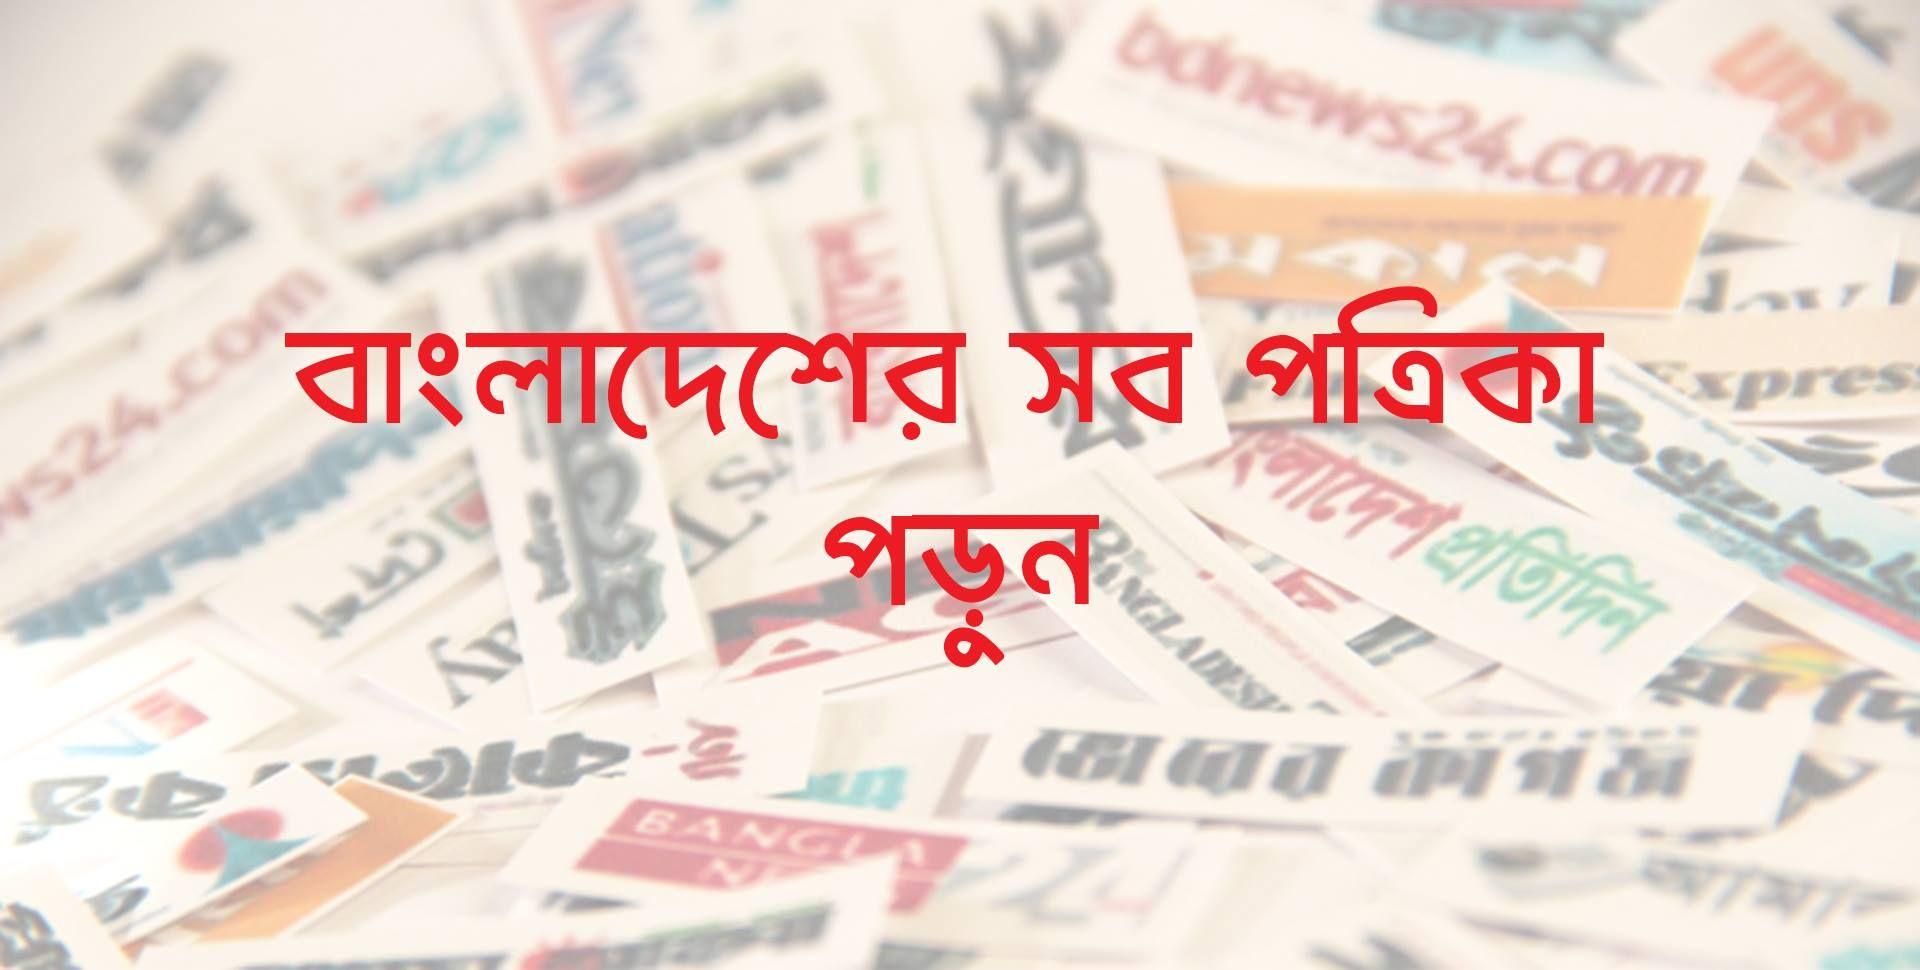 Pin by All Bangla Newspapers on allbanglanewspapersbd   E